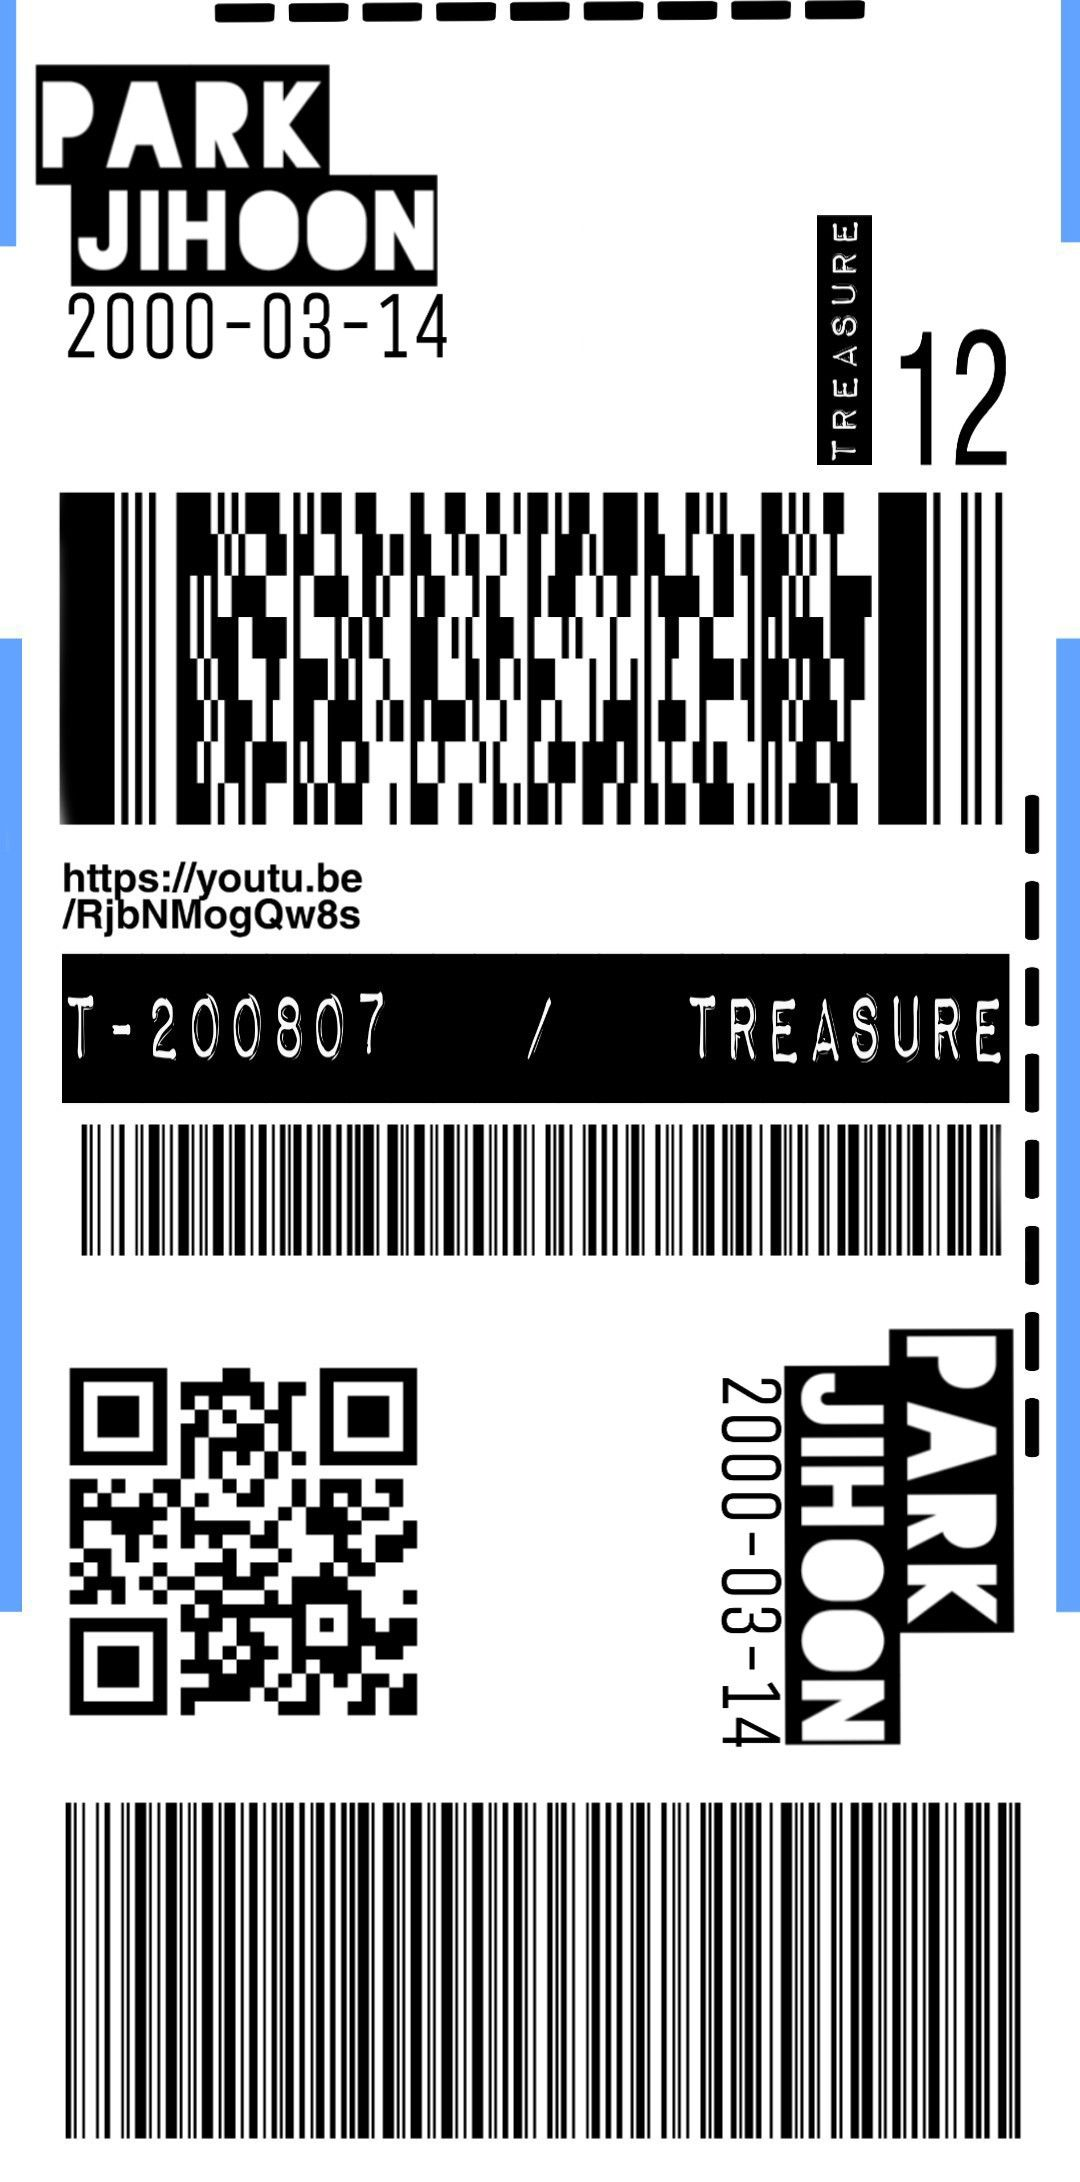 Treasure Tickets Wallpaper Phone Case Stiker